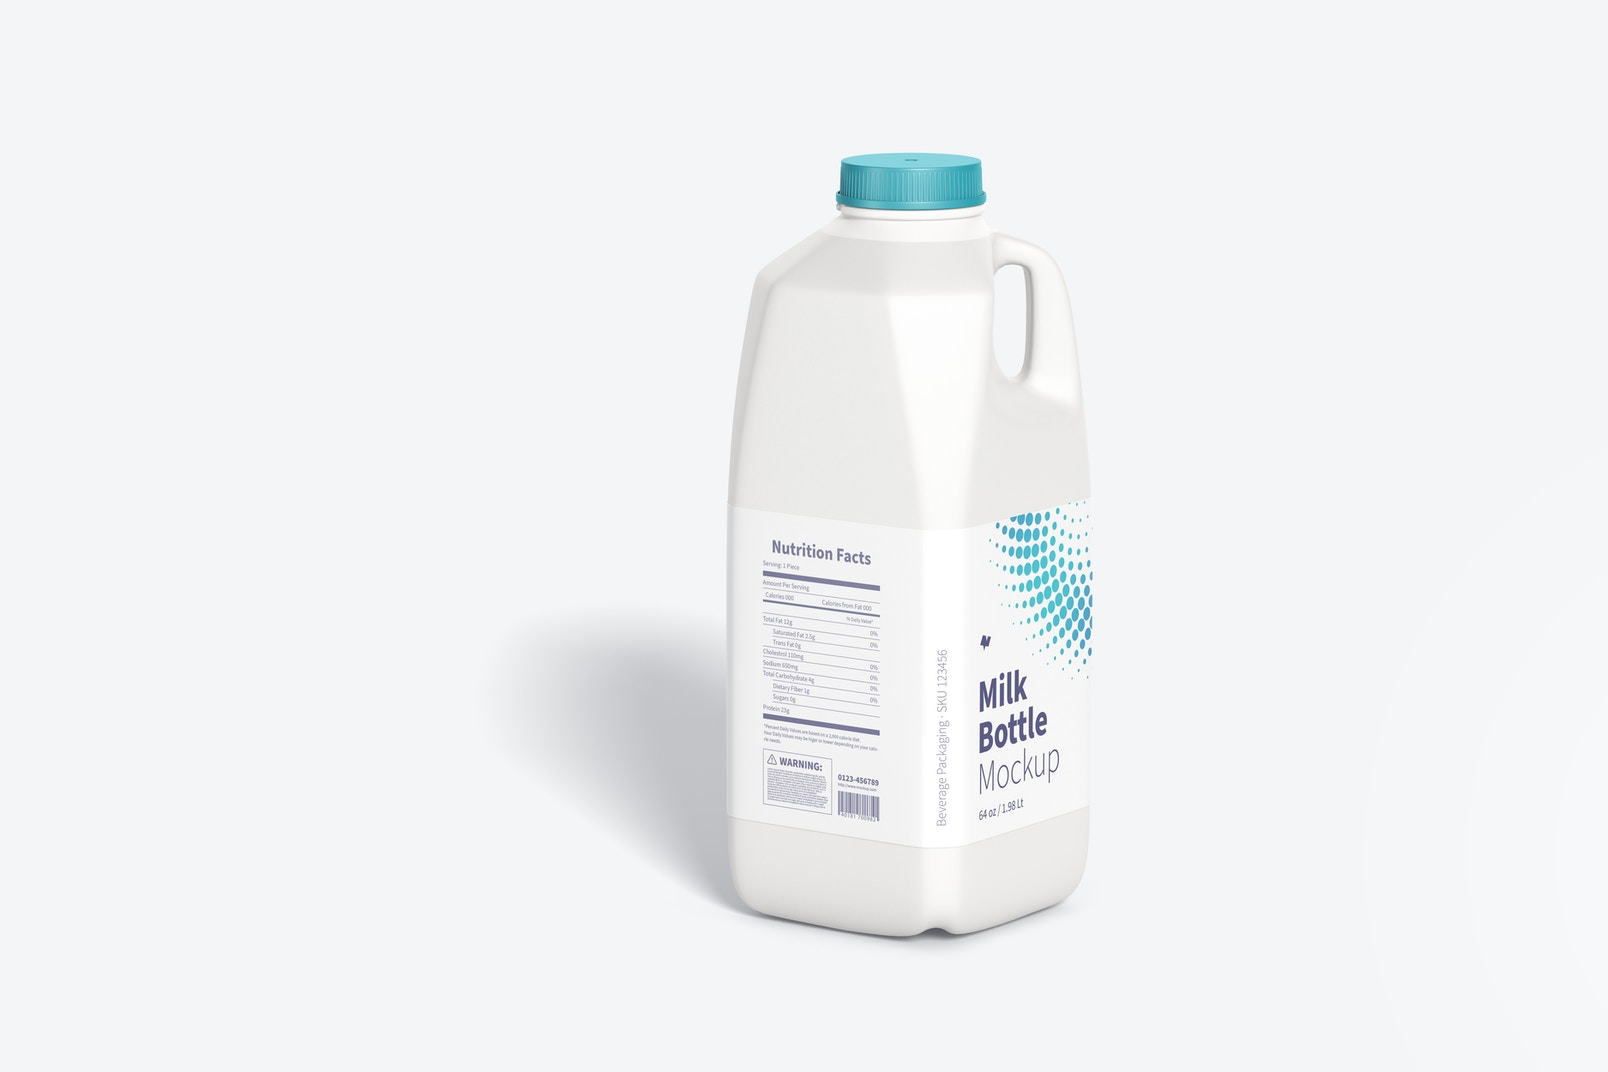 64 oz Milk Bottle Mockup